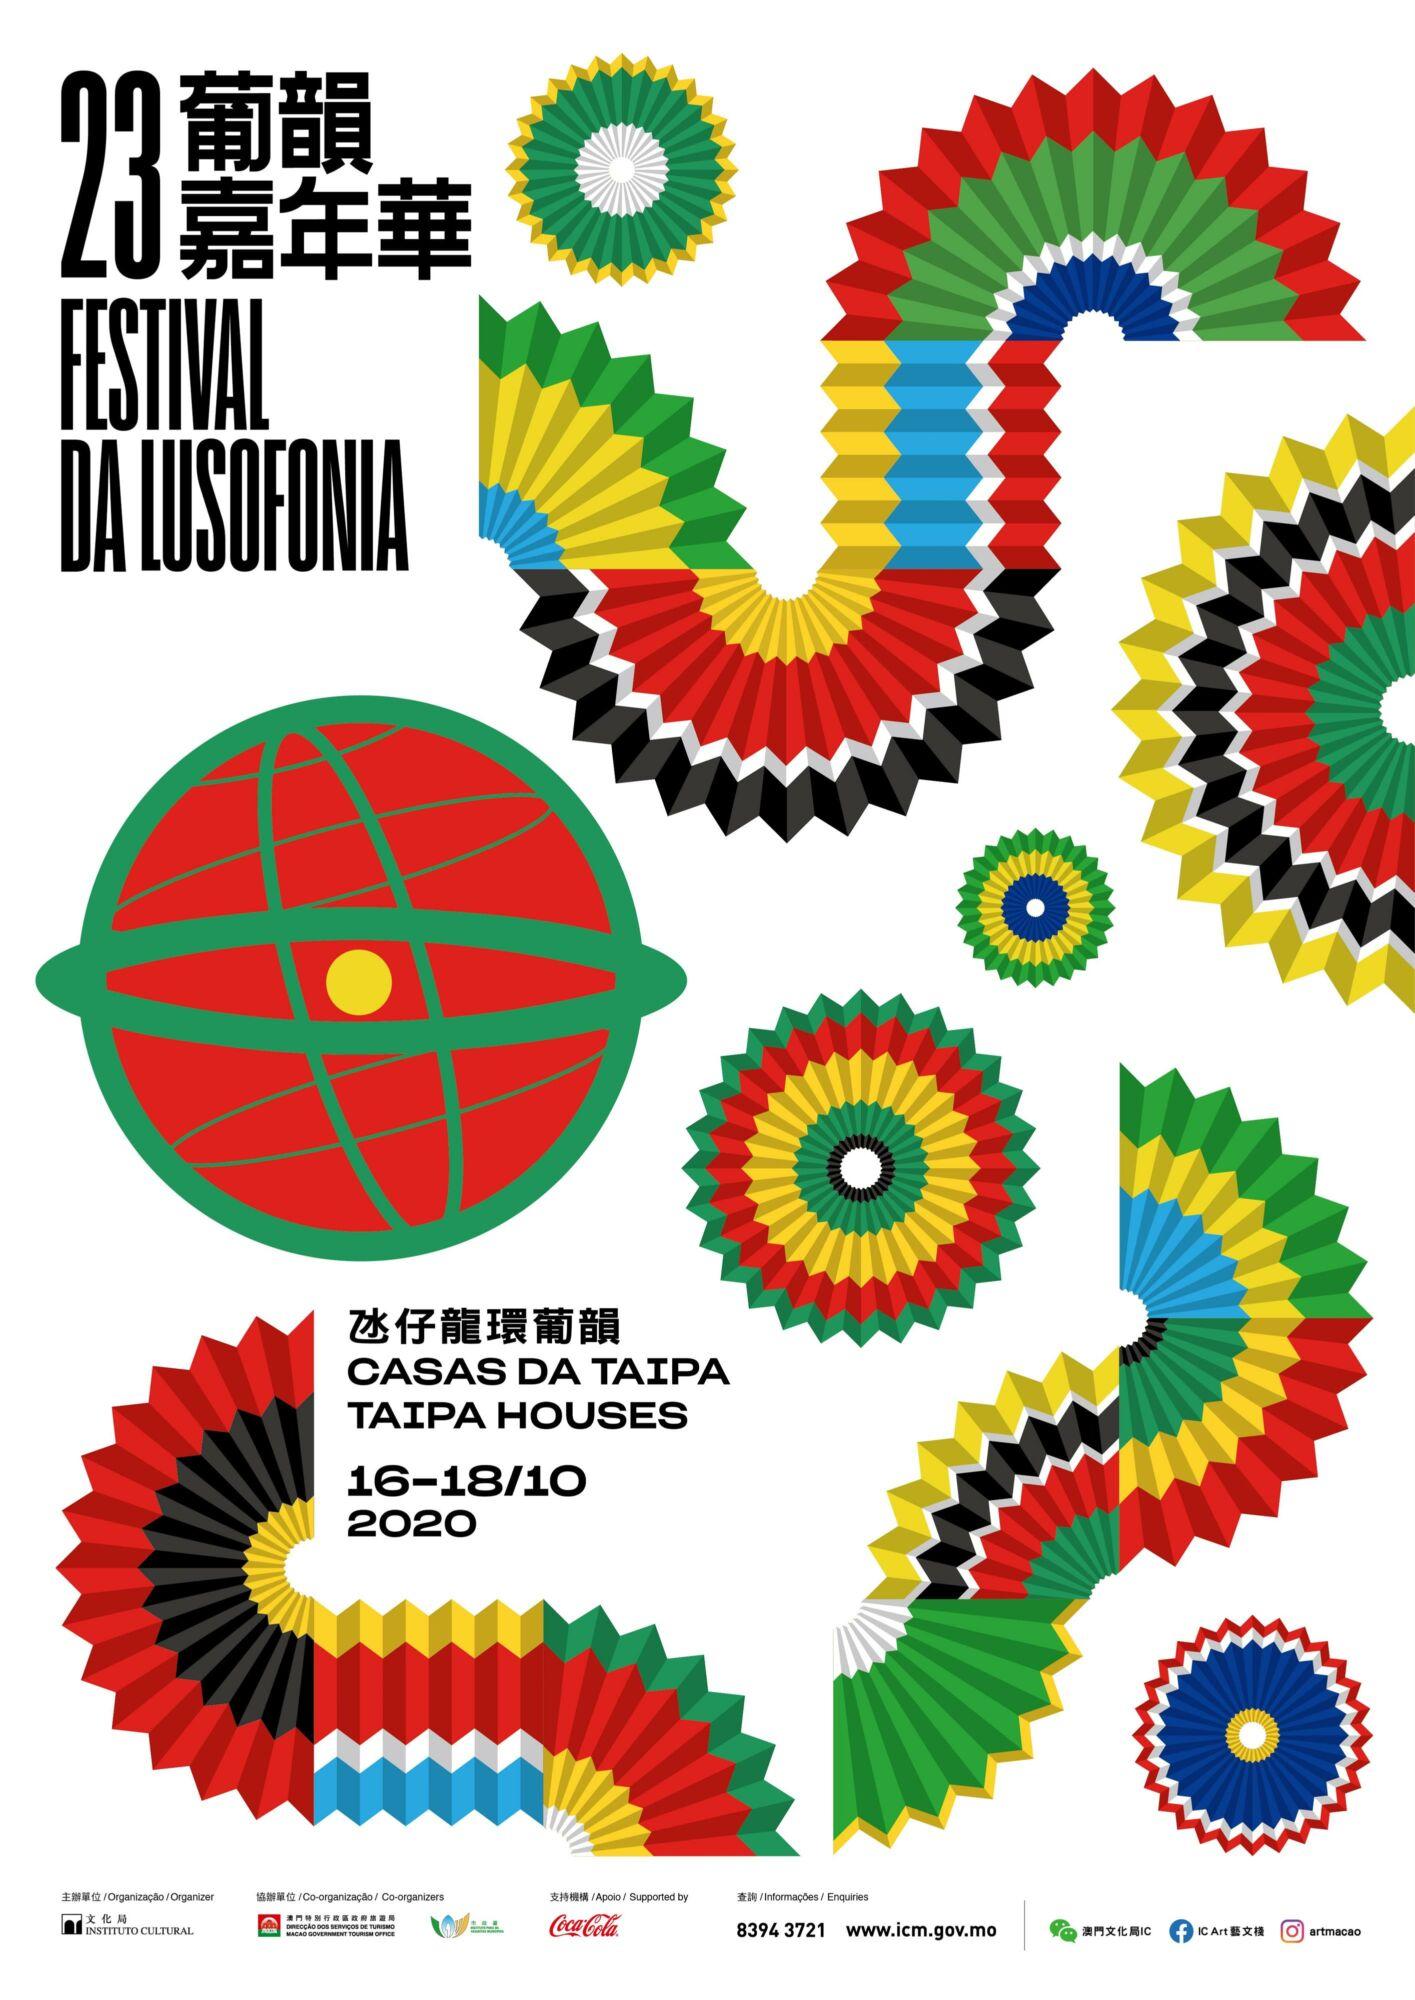 lusofonia 23rd edition macau